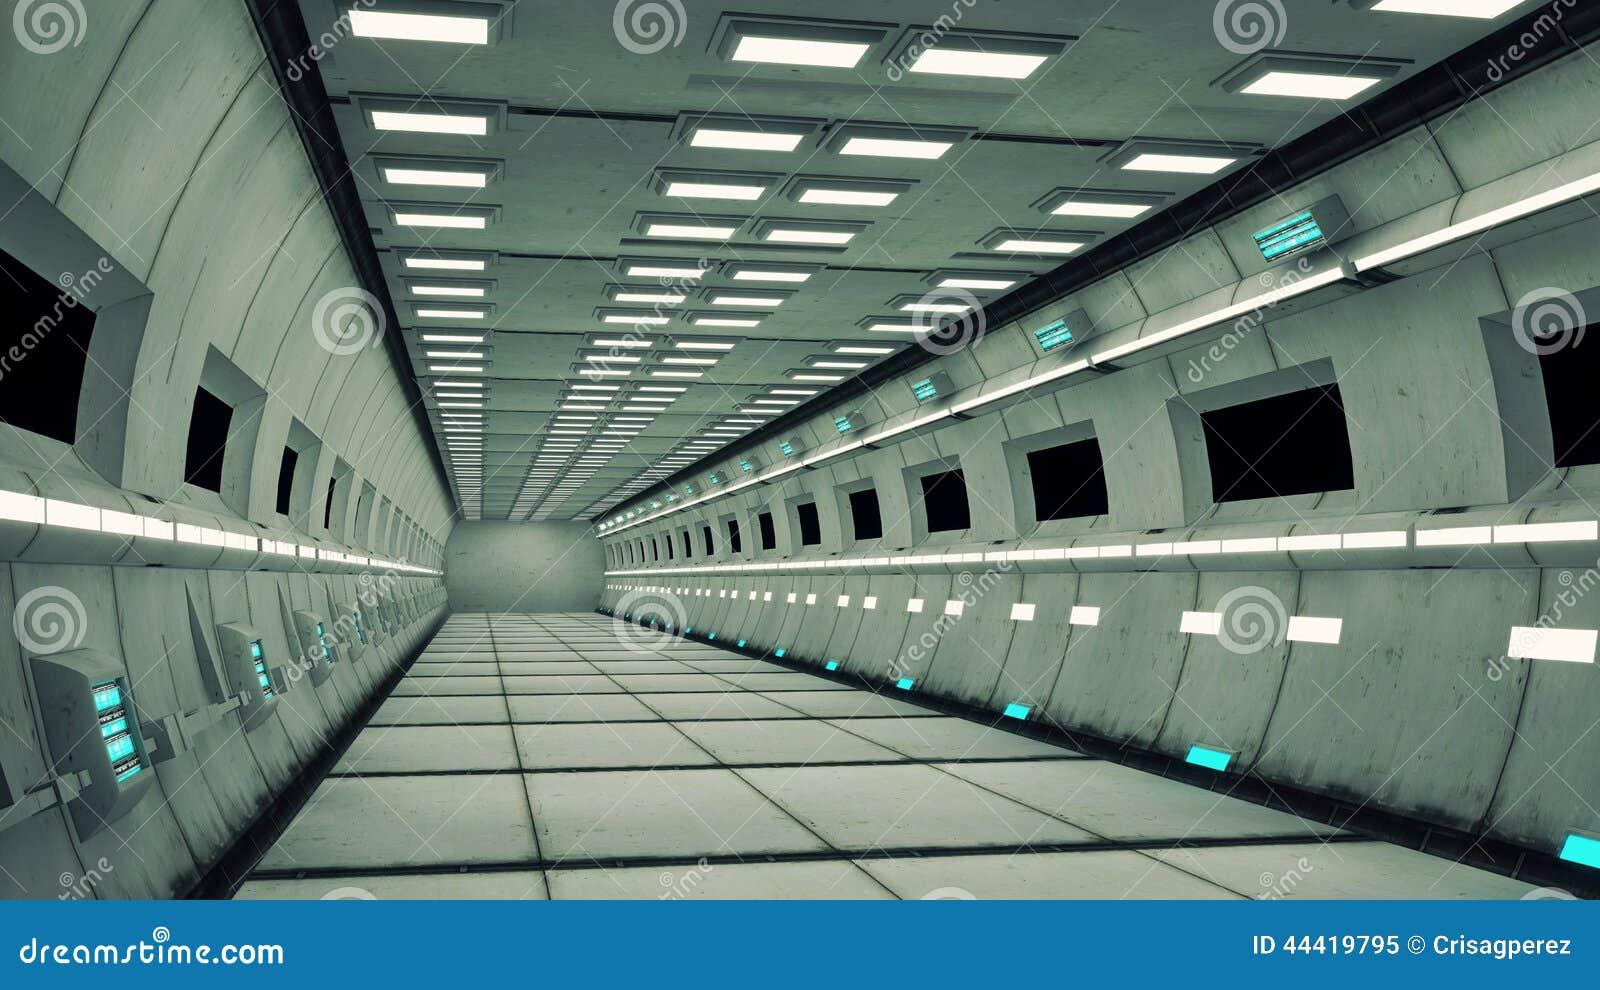 Interior De Ventana De Nave Espacial: Interno Dell'astronave, Vista Concentrare Con Il Pavimento